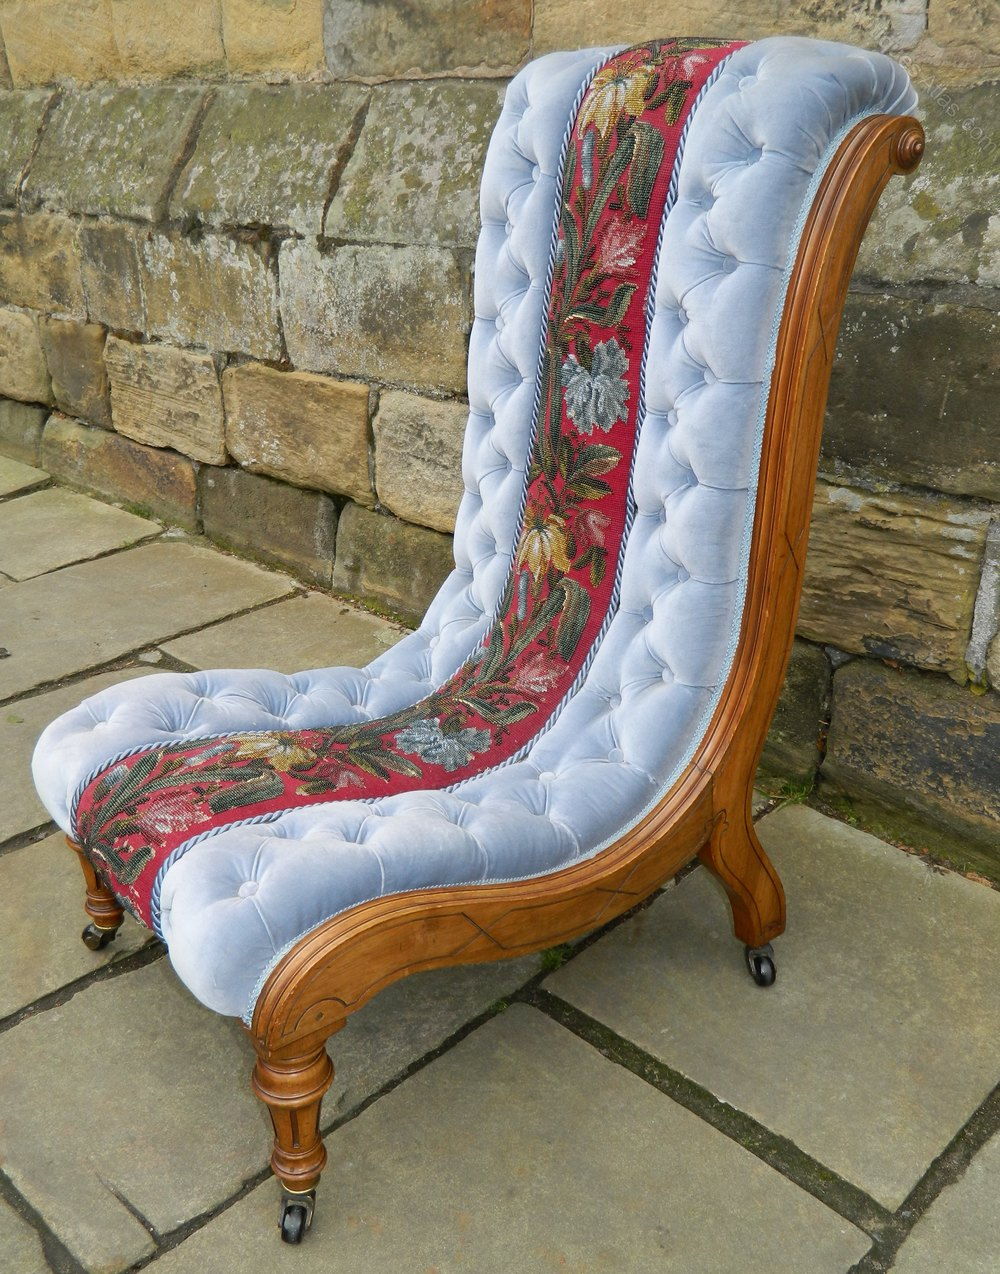 Ordinaire Victorian Slipper Chair Antique Slipper Chairs Slipper Chair Prayer Chair  Salon Chair ...